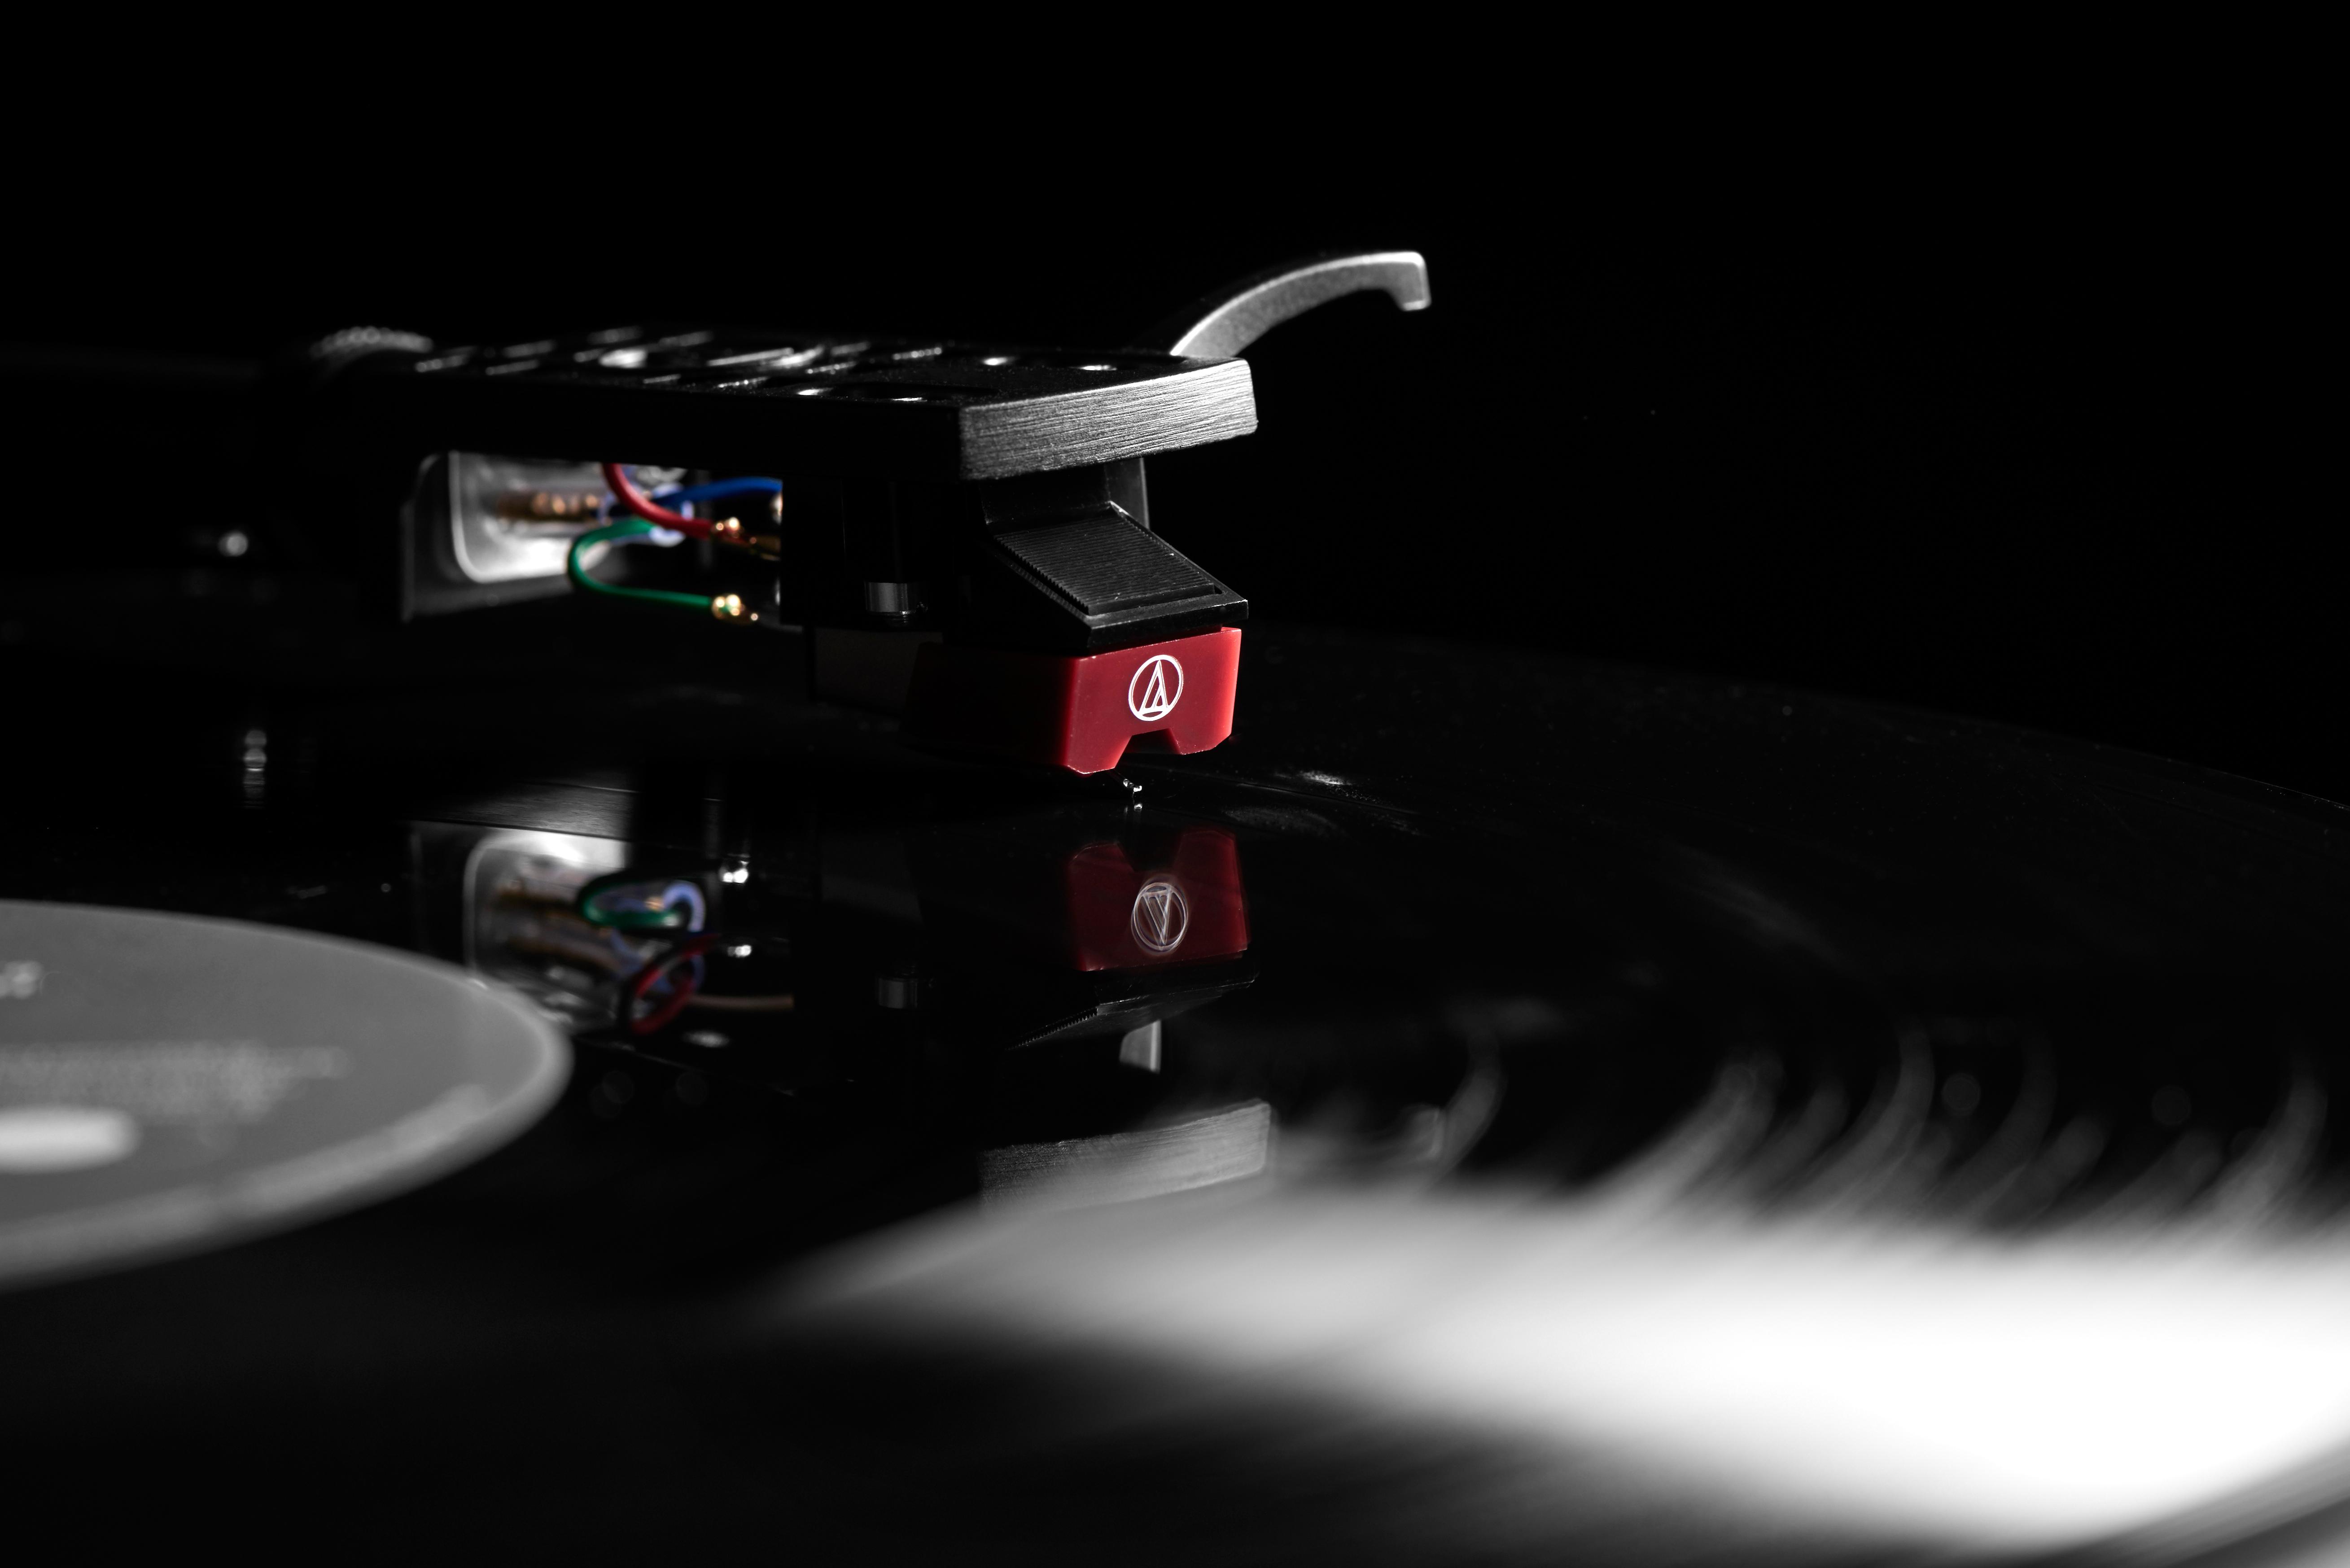 Audio Technica LP5 Turntable